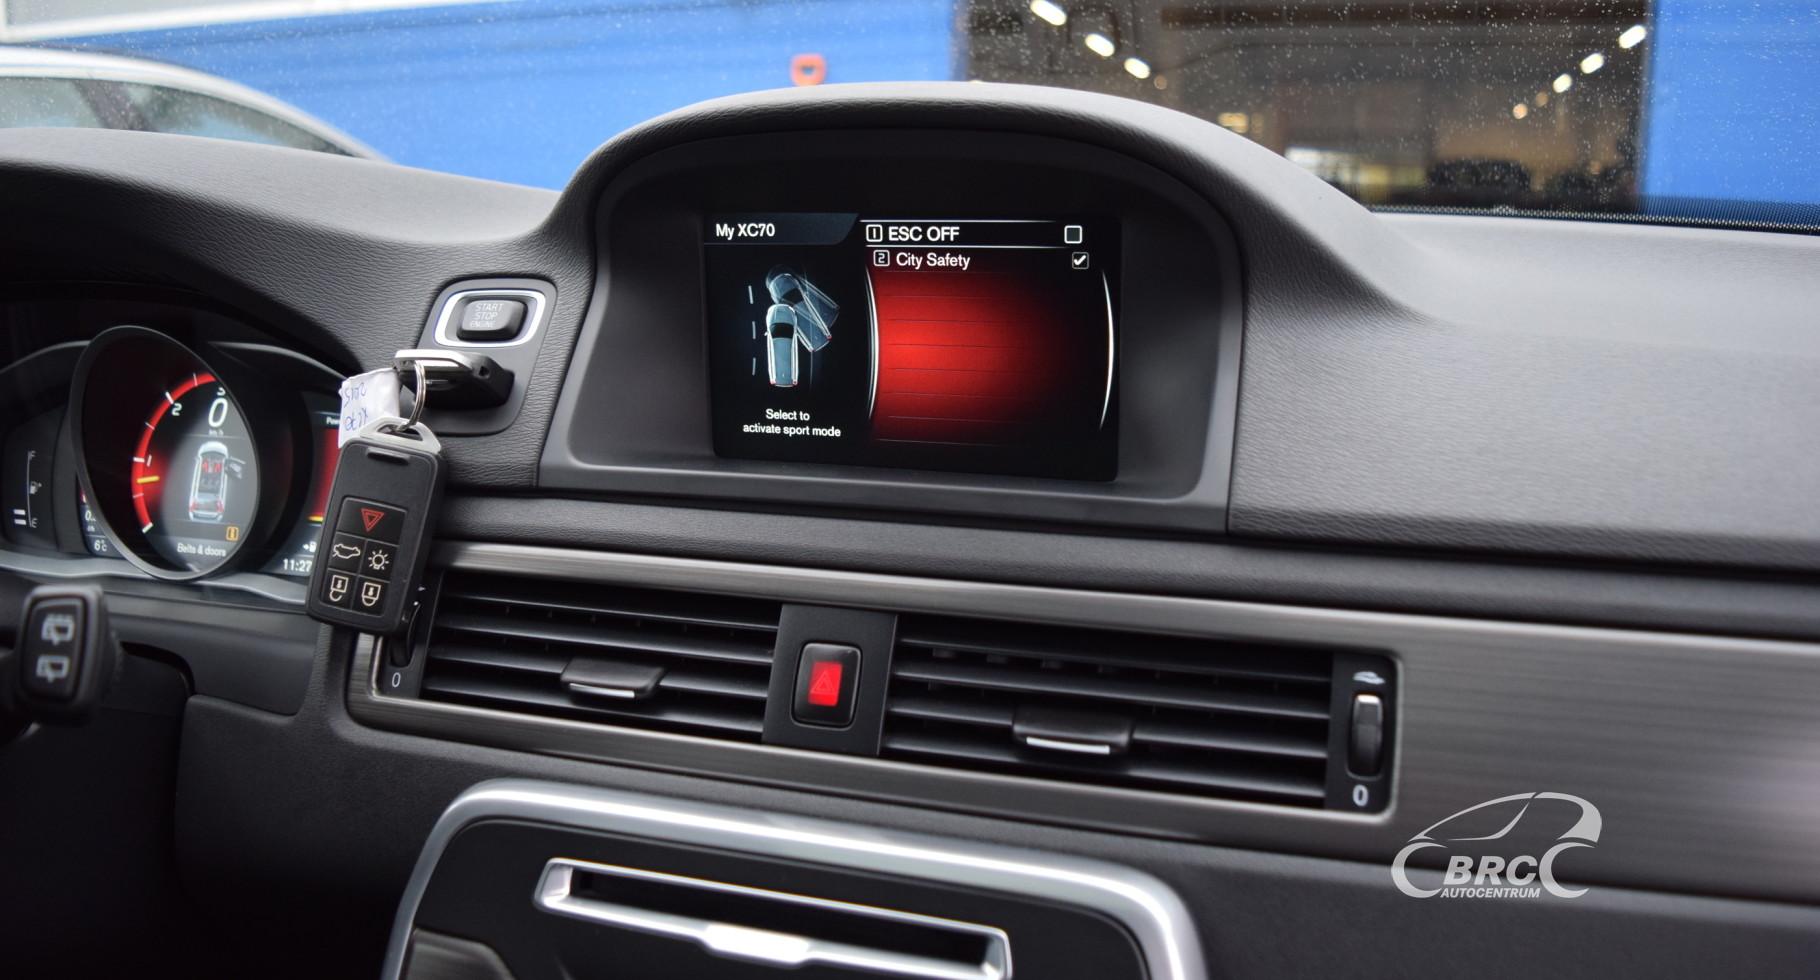 Volvo XC 70 Inscription D5 AWD Momentum